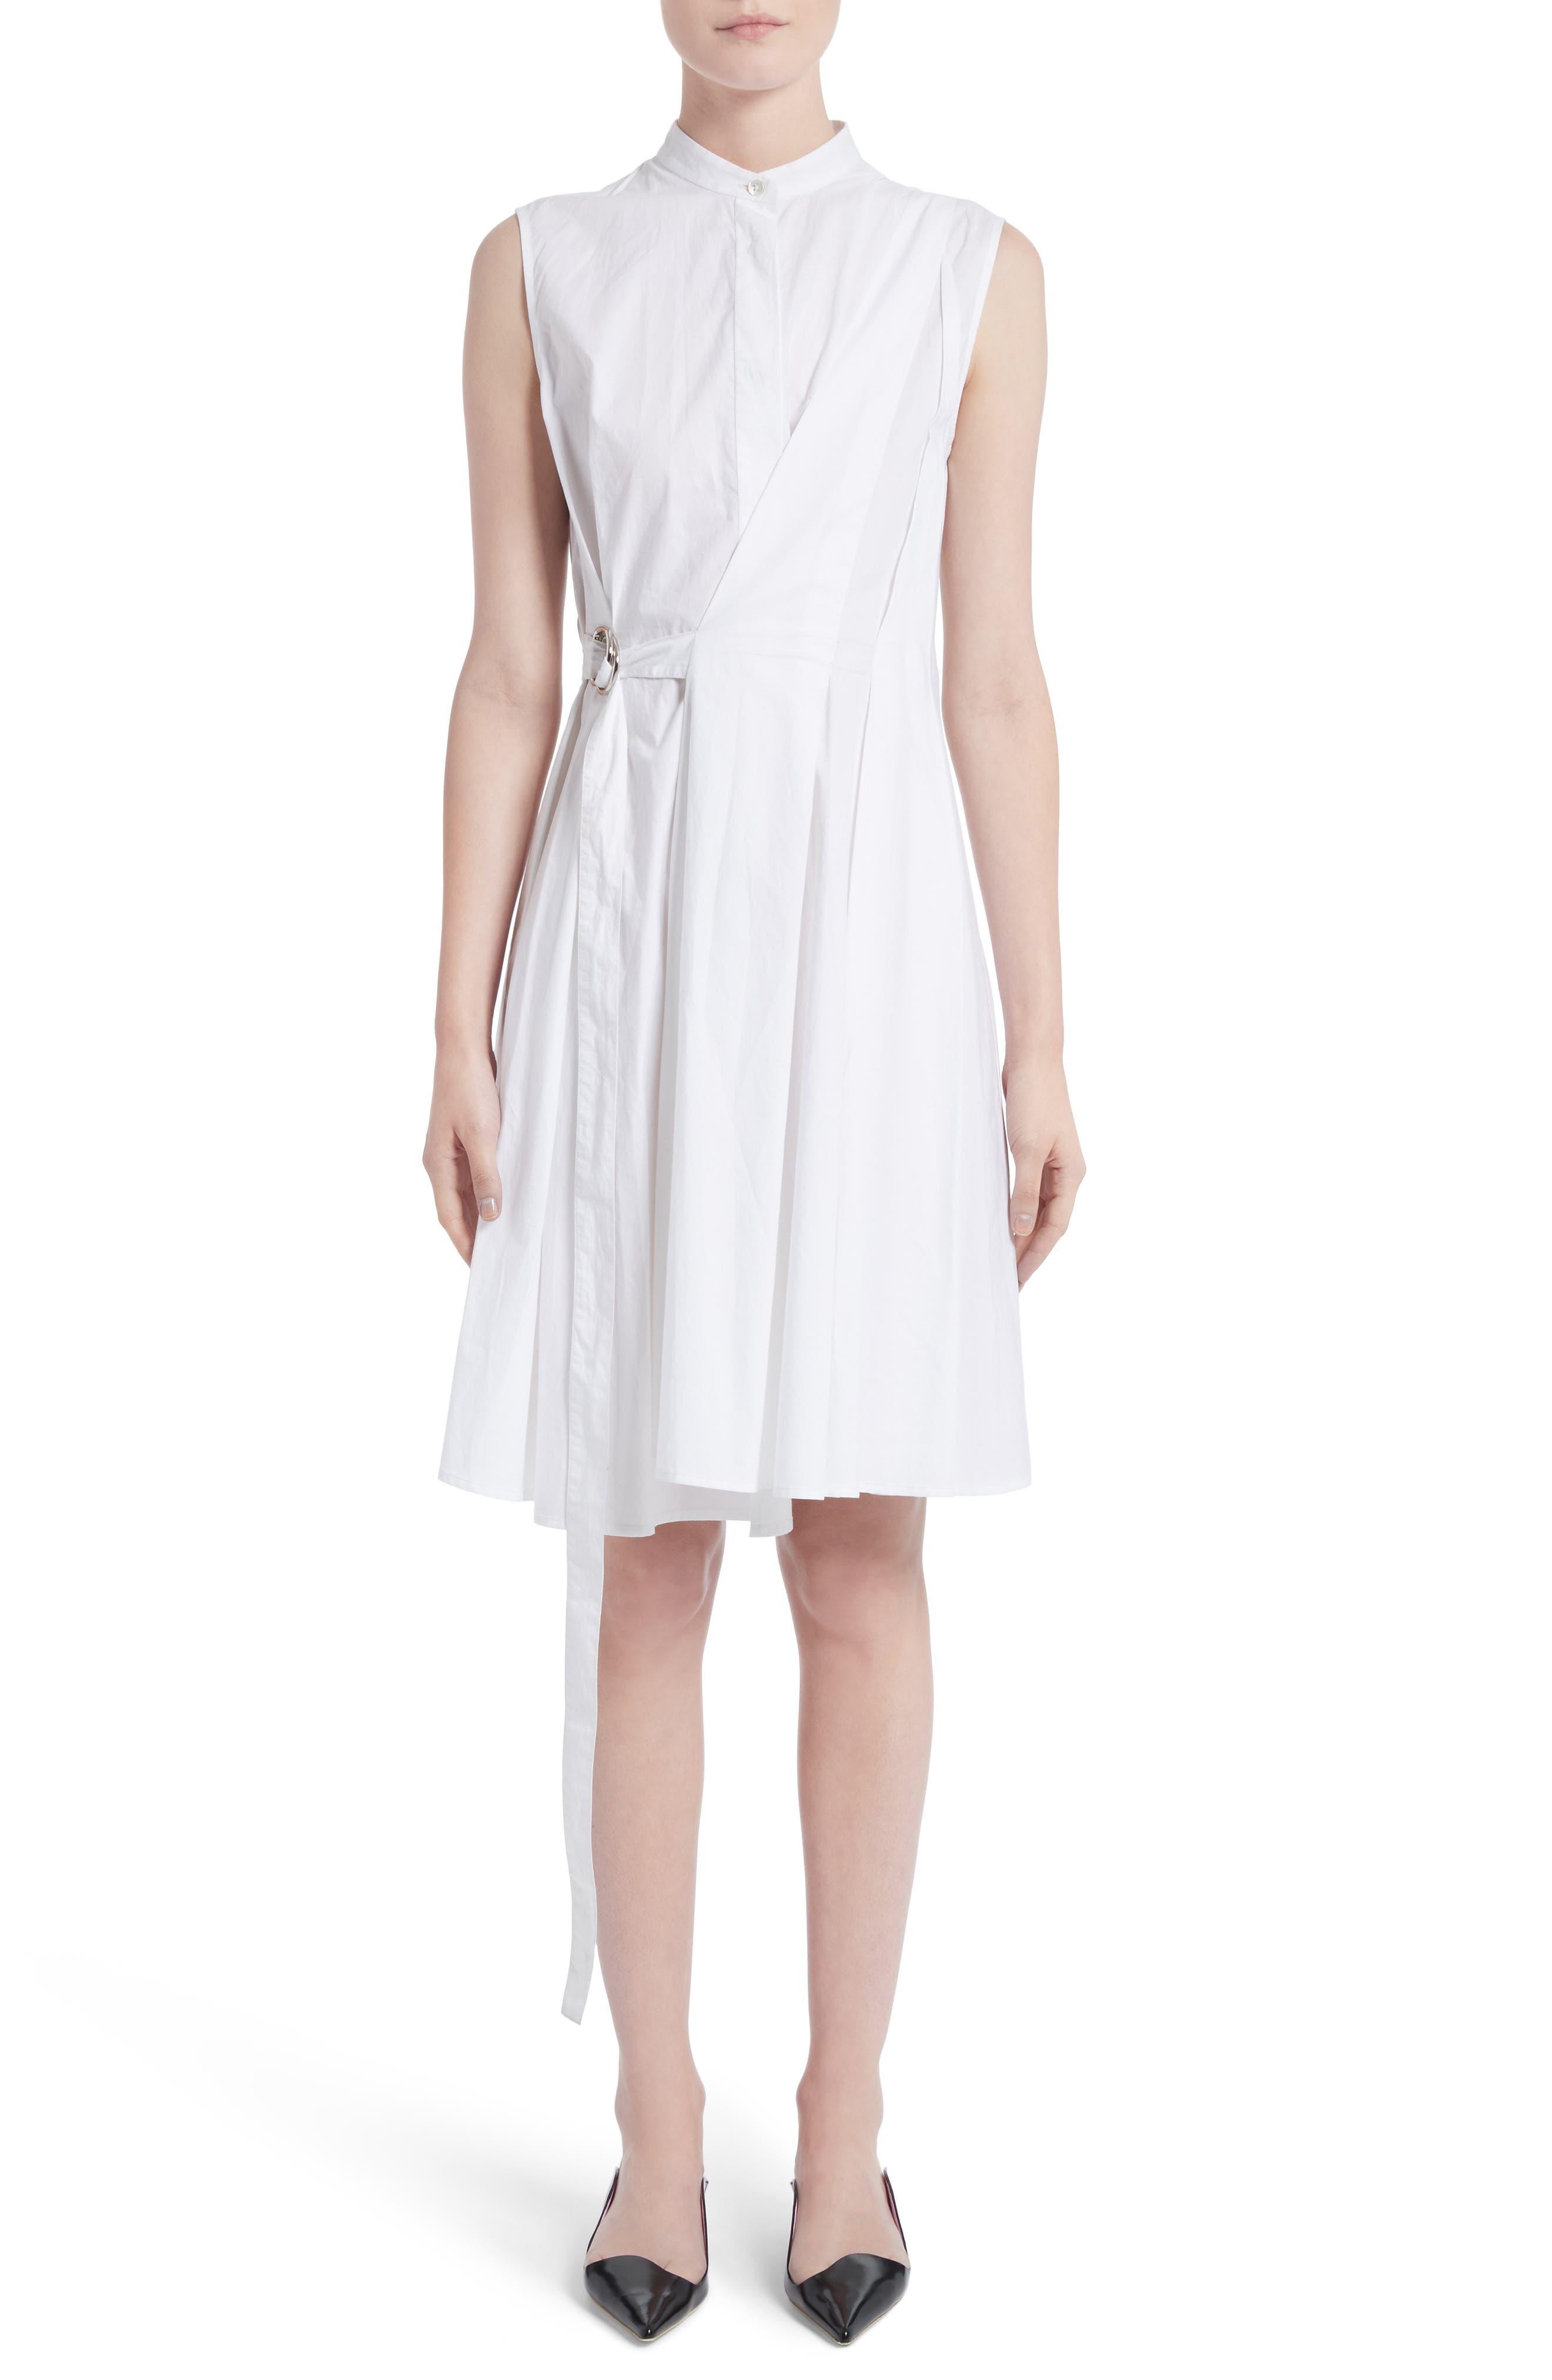 PROENZA SCHOULER,                             Cotton Poplin Wrap Dress,                             Main thumbnail 1, color,                             100